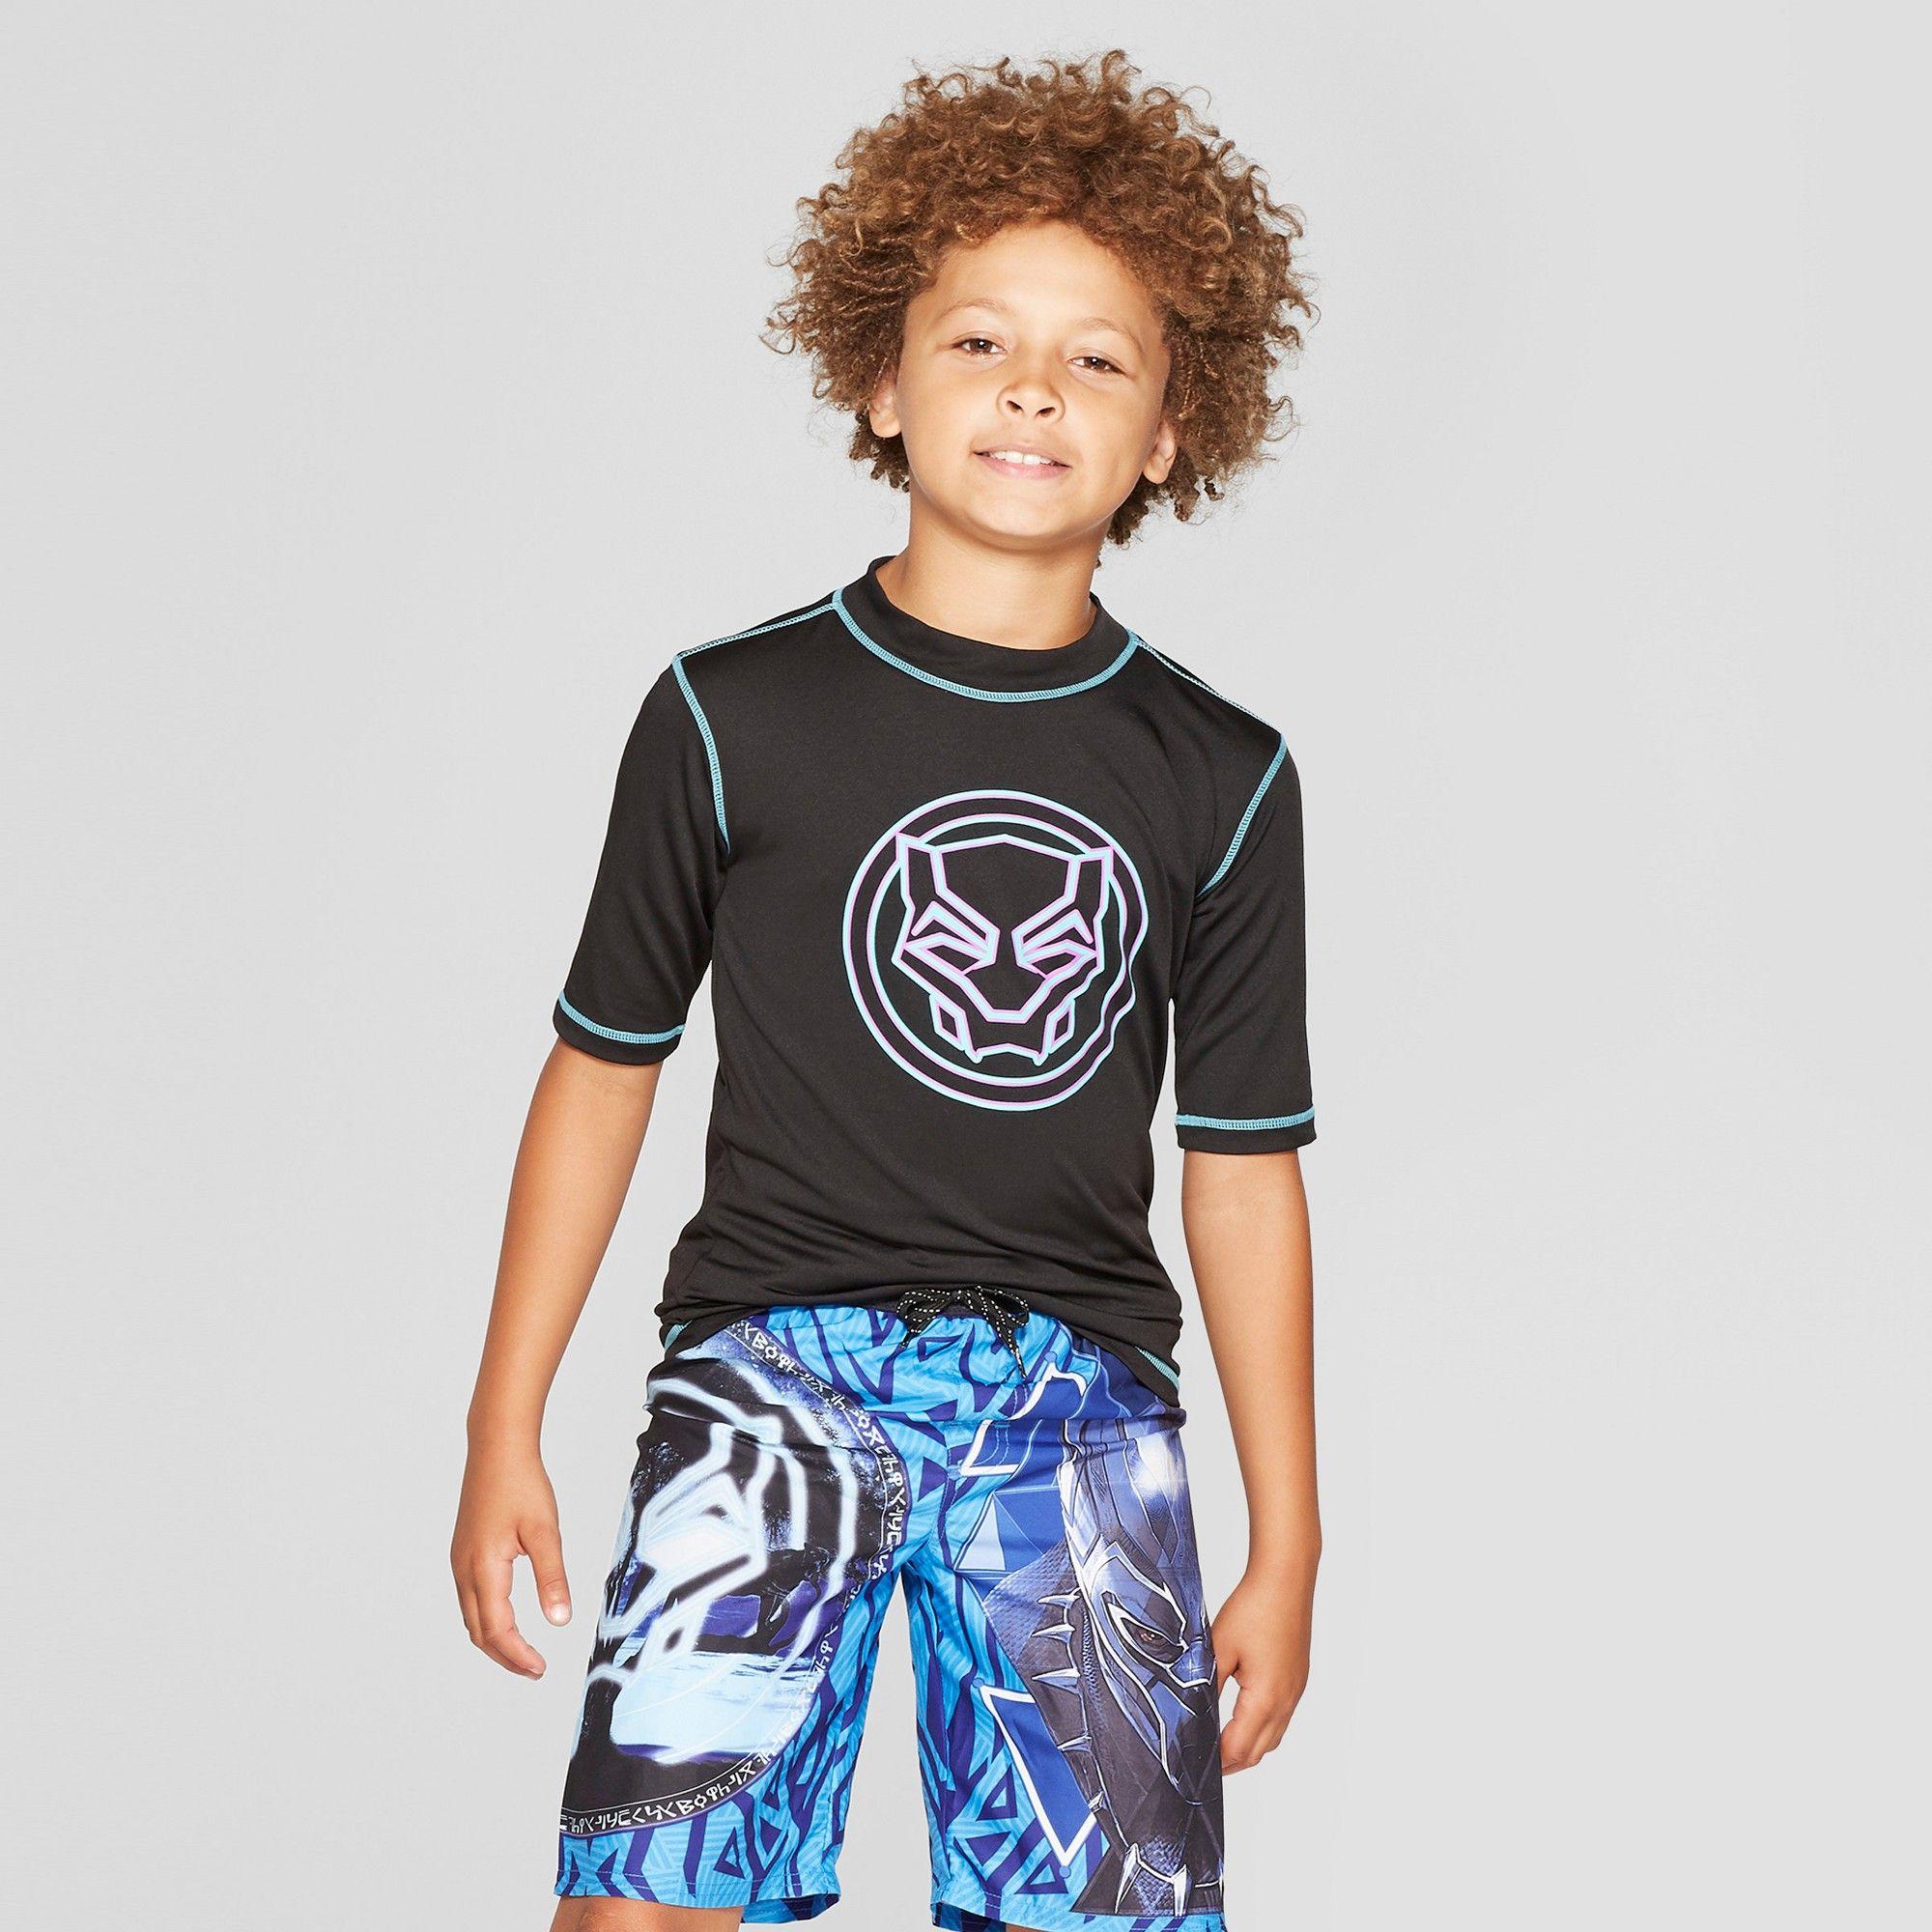 083bdfaac4 Boys' Black Panther Rash Guard - XS | Products | Rash guard, Black ...